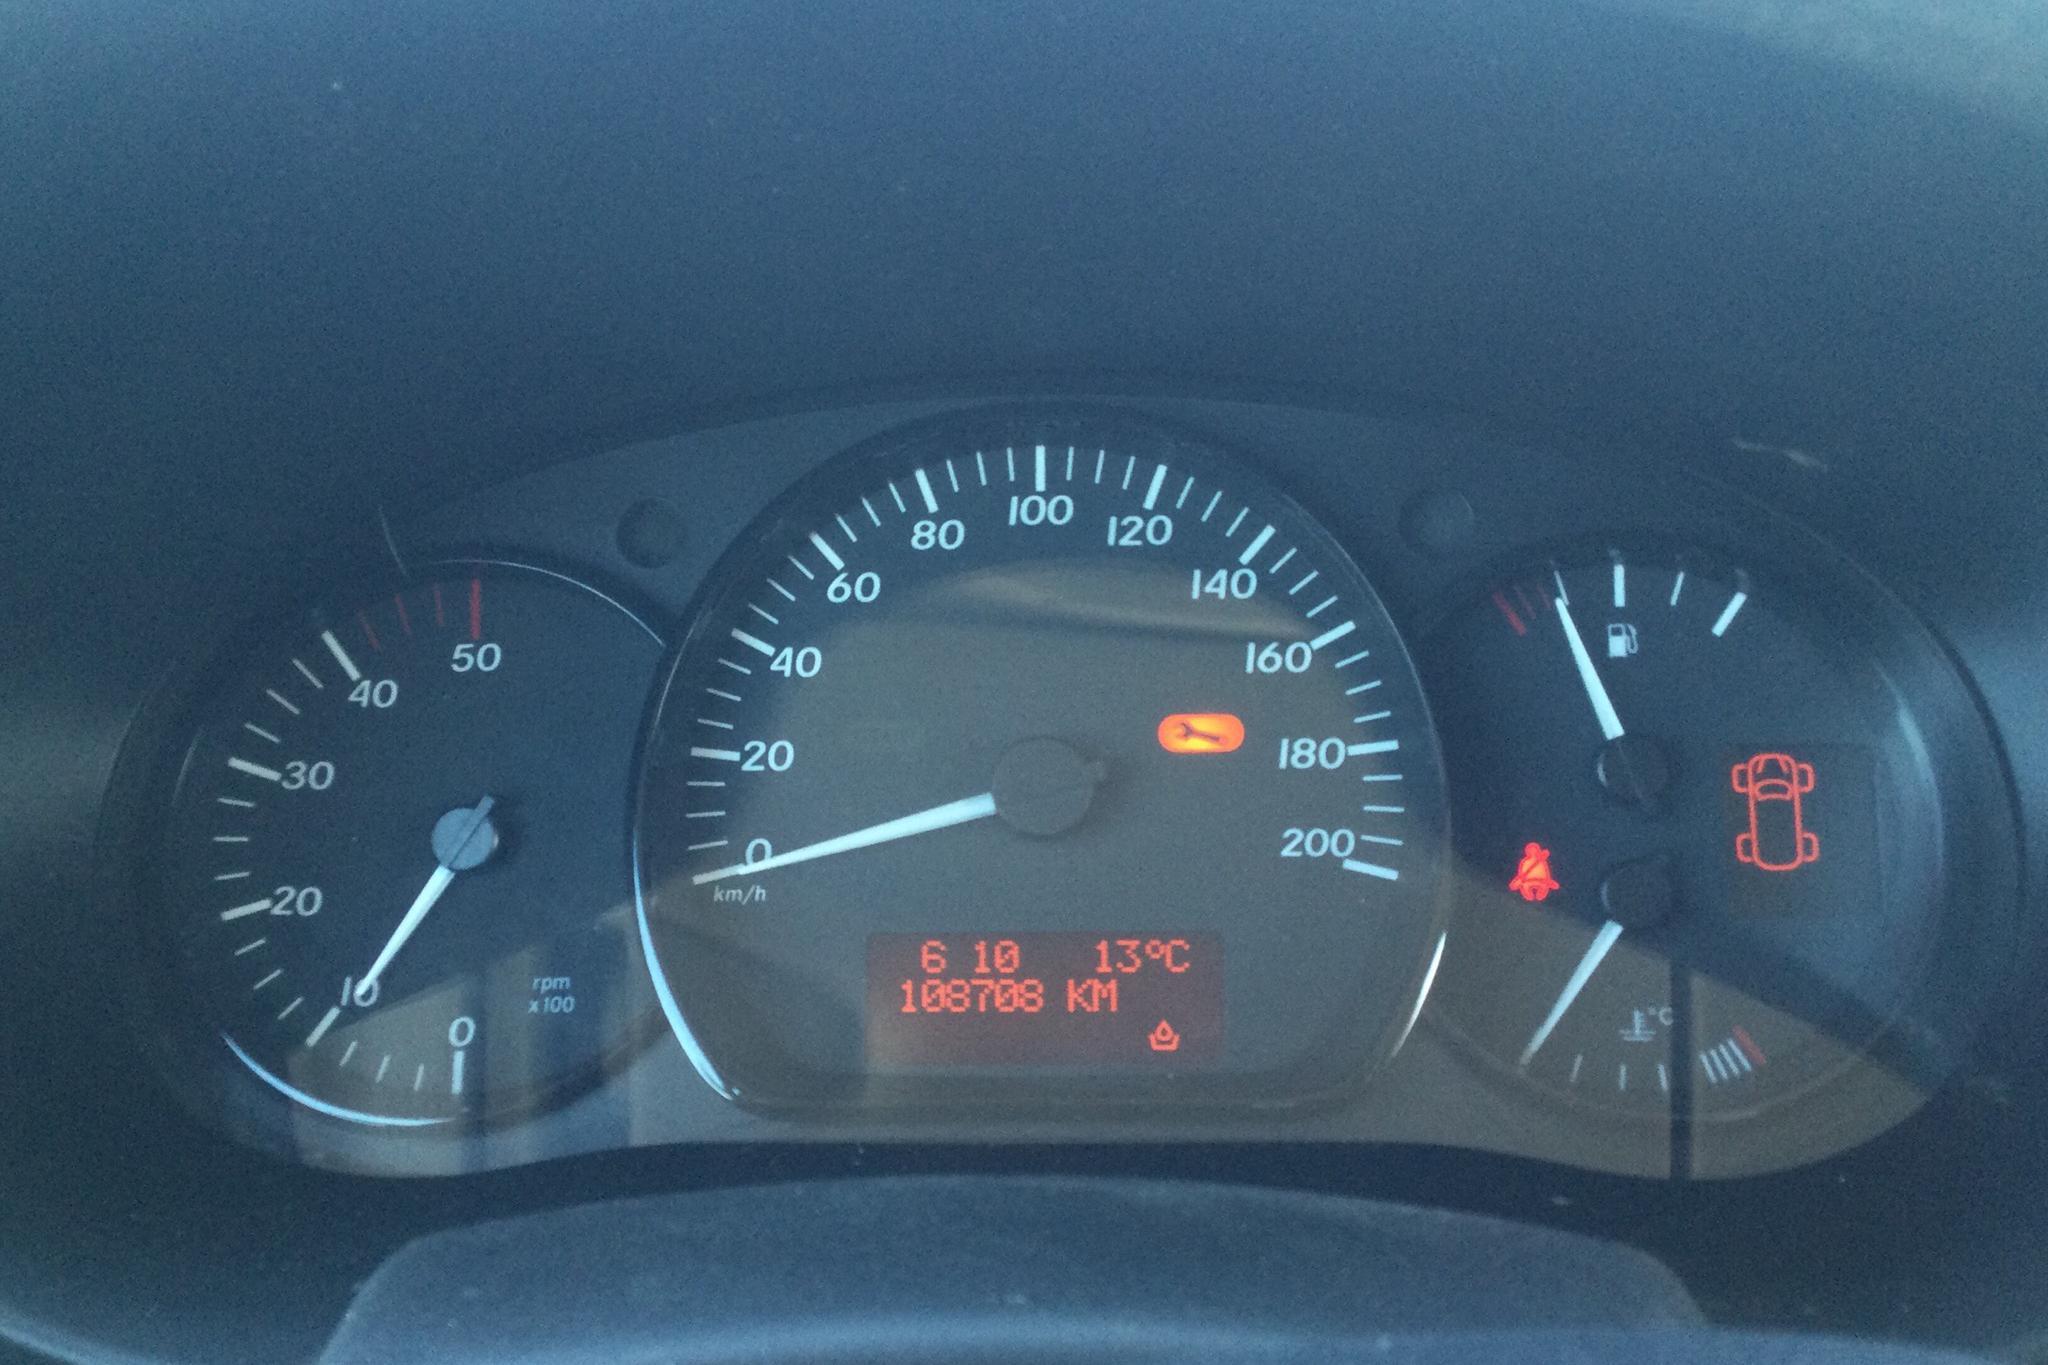 Mercedes Citan 109 1.5 CDI (90hk) - 108 730 km - Manual - red - 2015